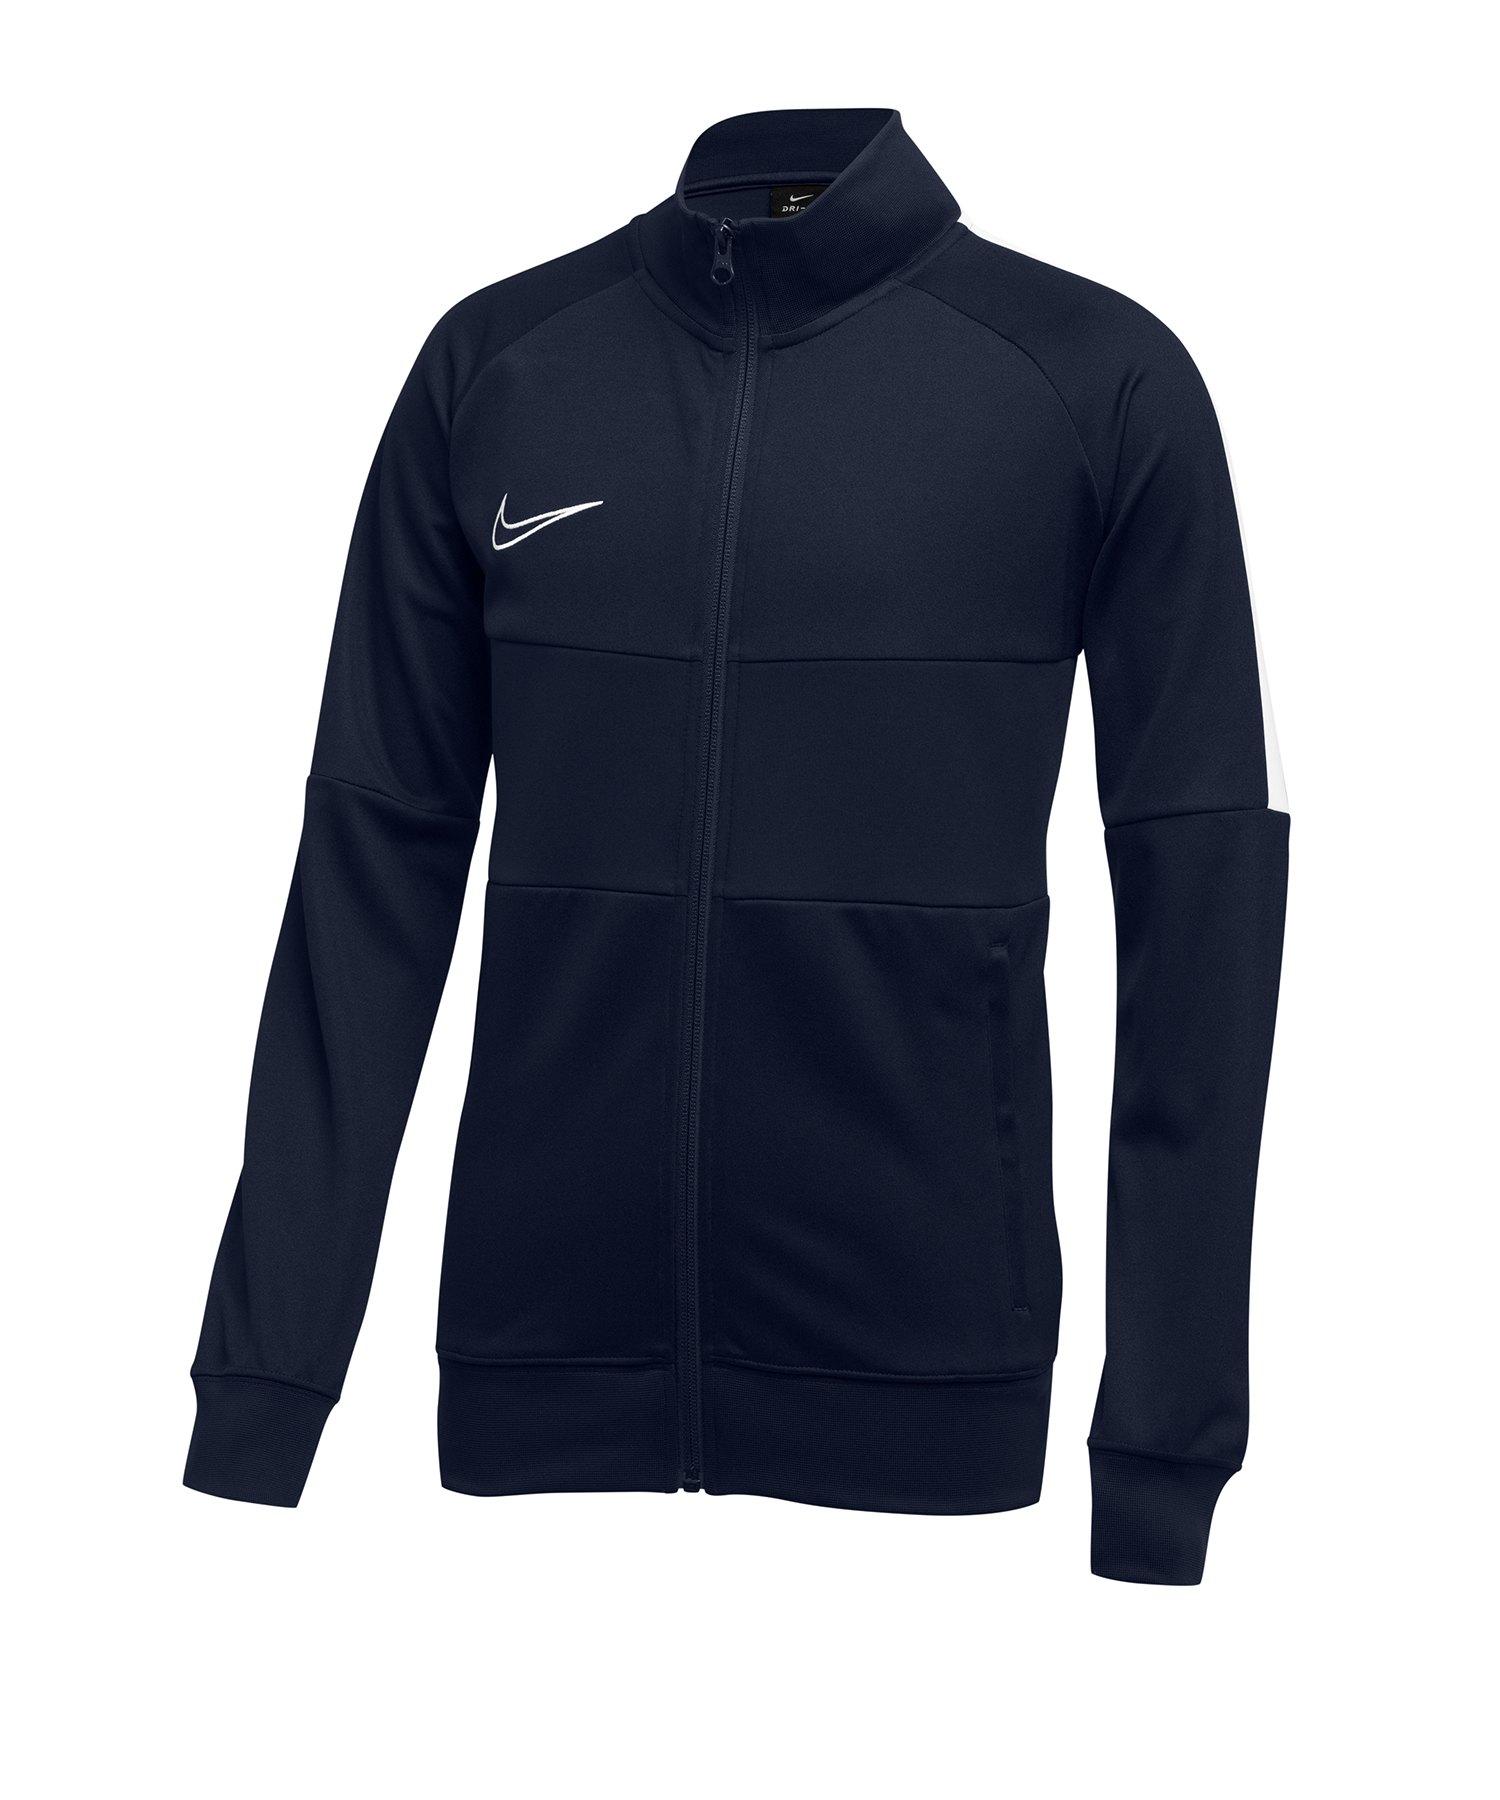 Nike Academy 19 Dri-FIT Jacke Kids Blau F451 - Blau